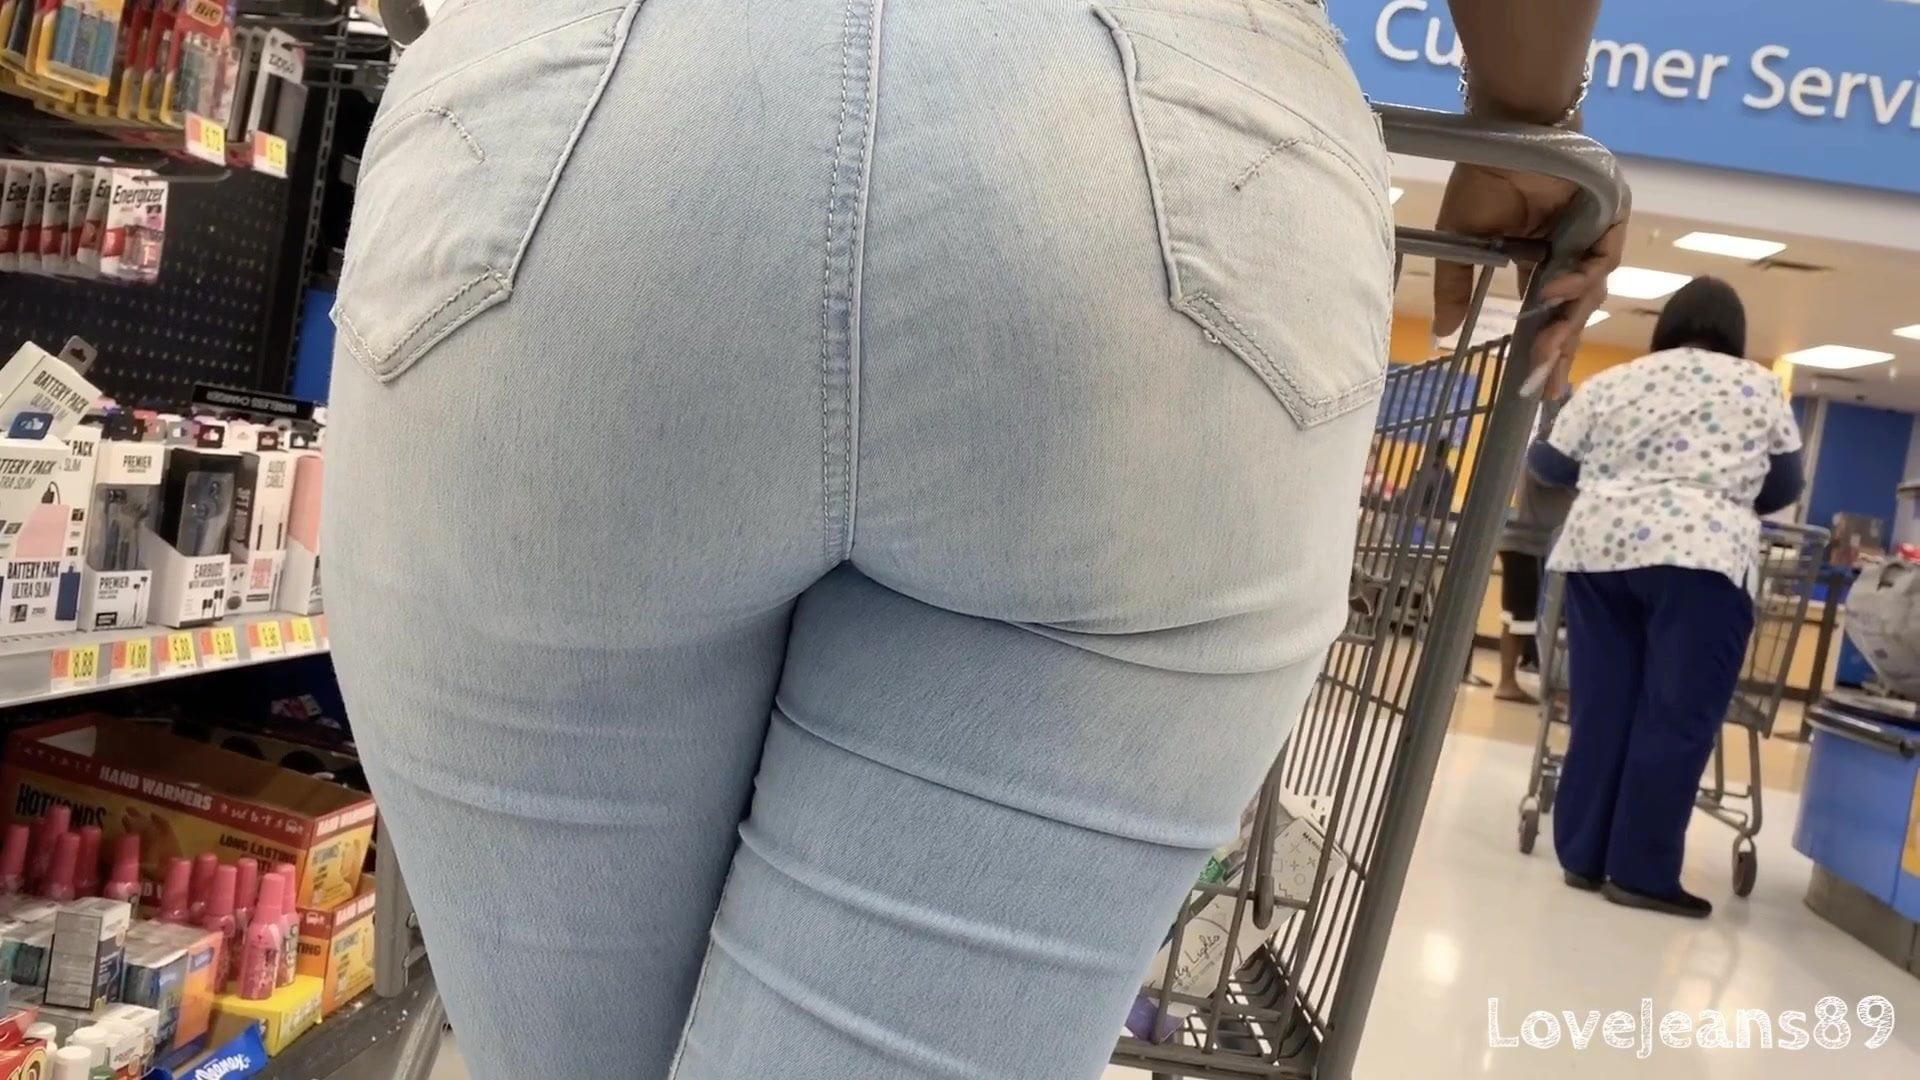 Is kim kardashian's butt getting more ridiculous